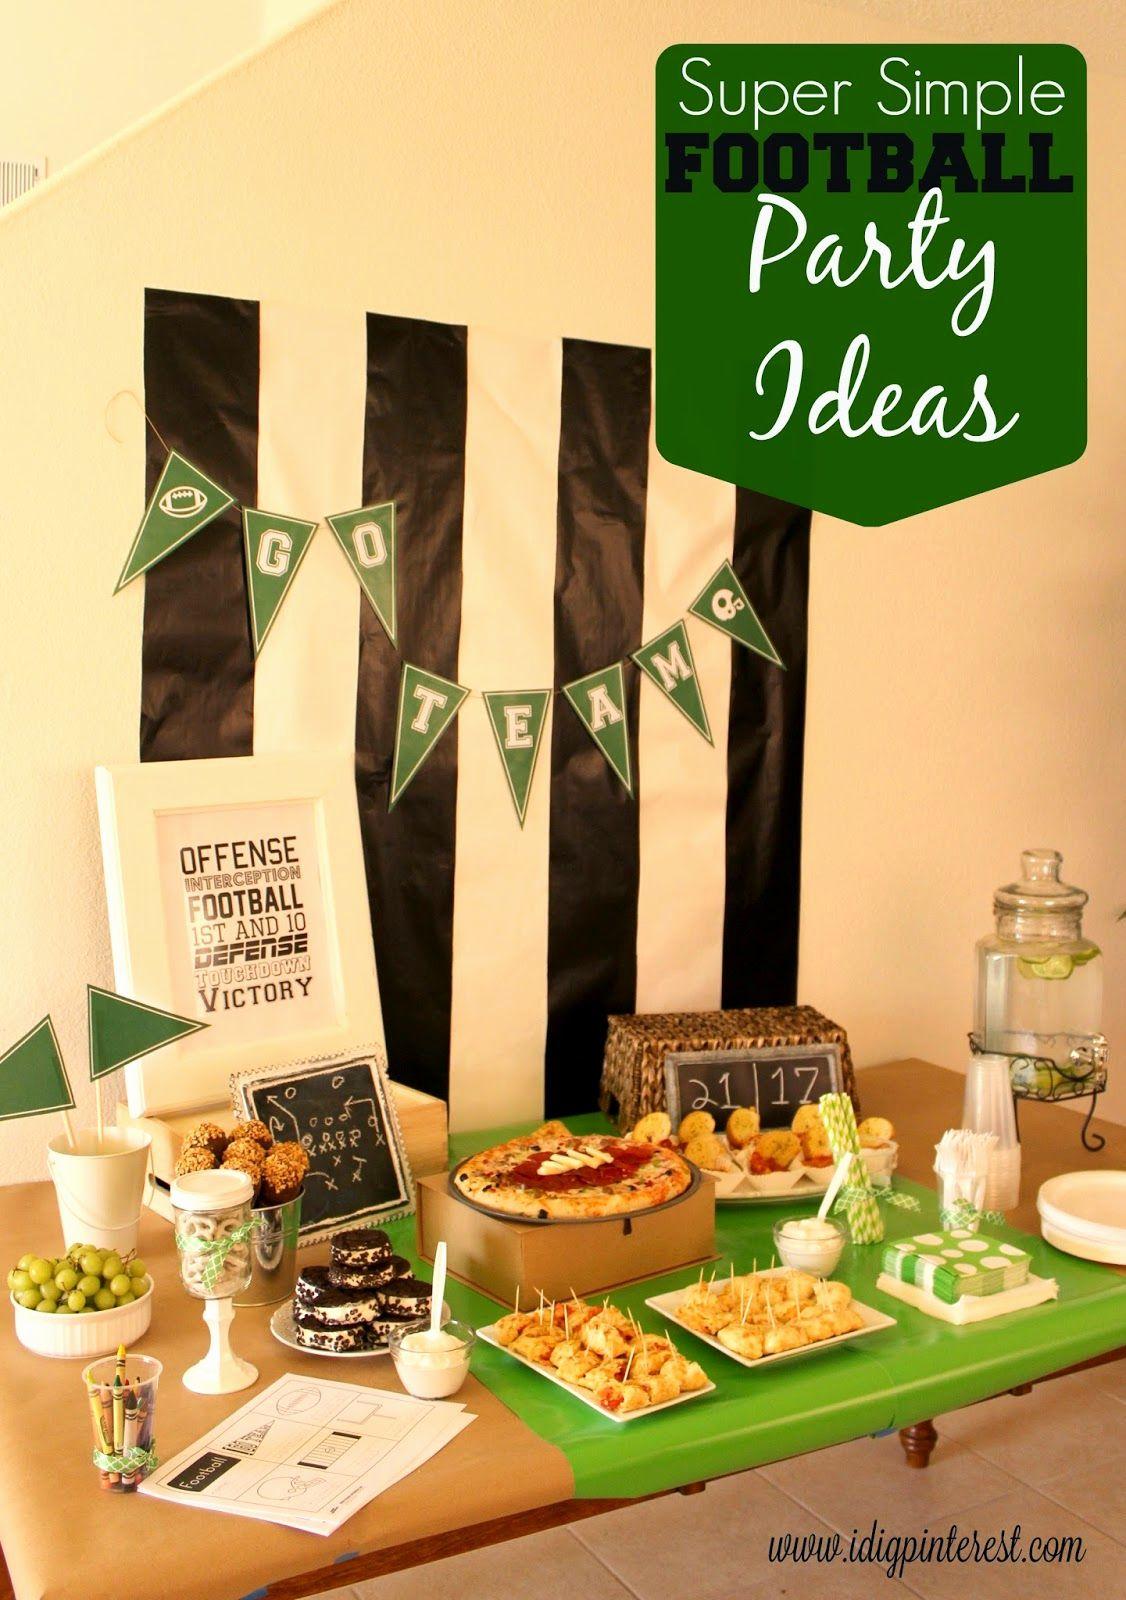 It Works Wrap Party Invitation Elegant Super Simple Football Party Ideas I Dig Pinterest Football Party Football Party Food Superbowl Party Decorations